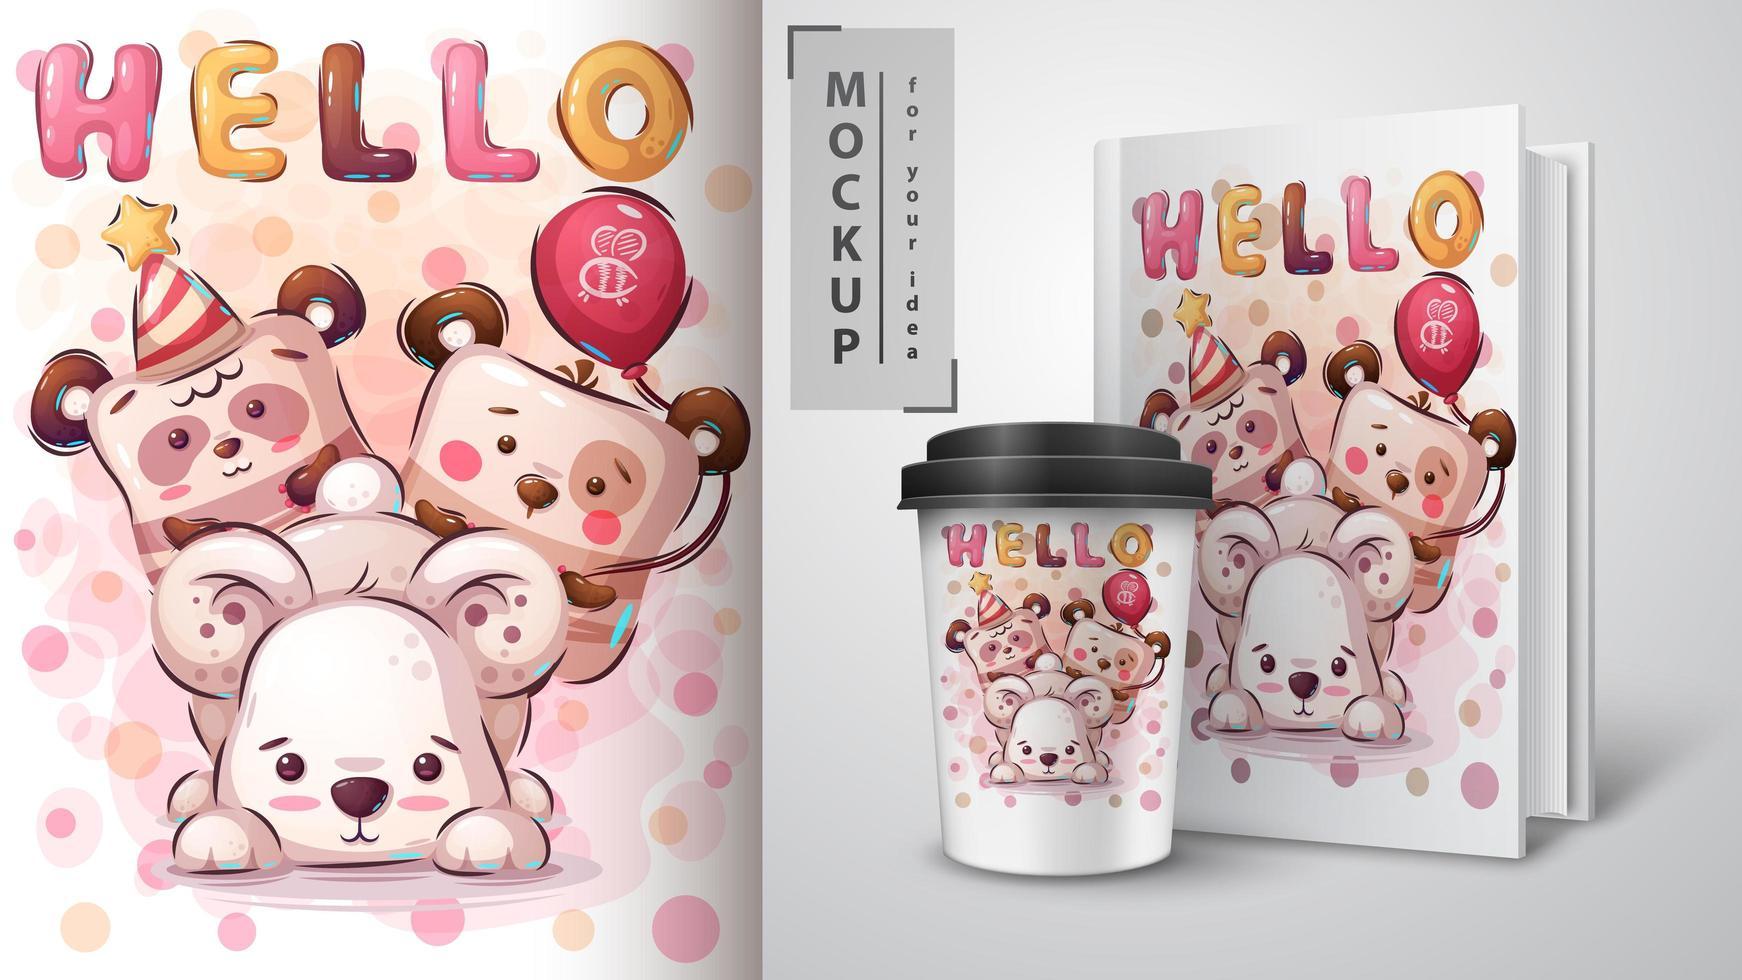 Teddy bear poster and merchandising vector